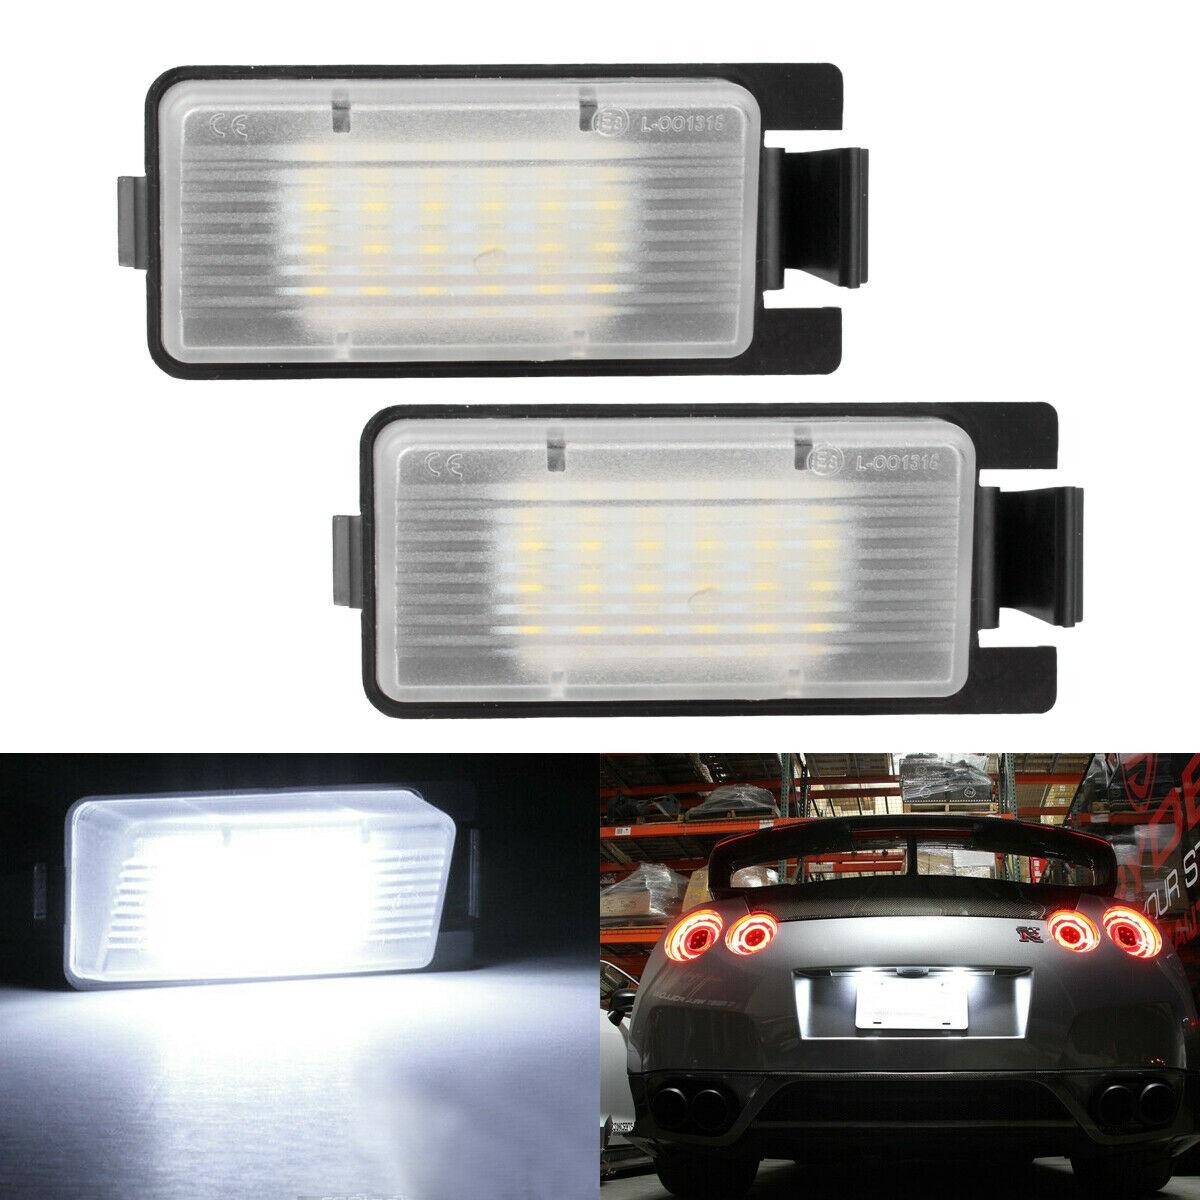 1 Pair License  Plate  Lights For Infiniti G25 G35 G37 S60 Sedan 2003-2013 Left And Right Boxed